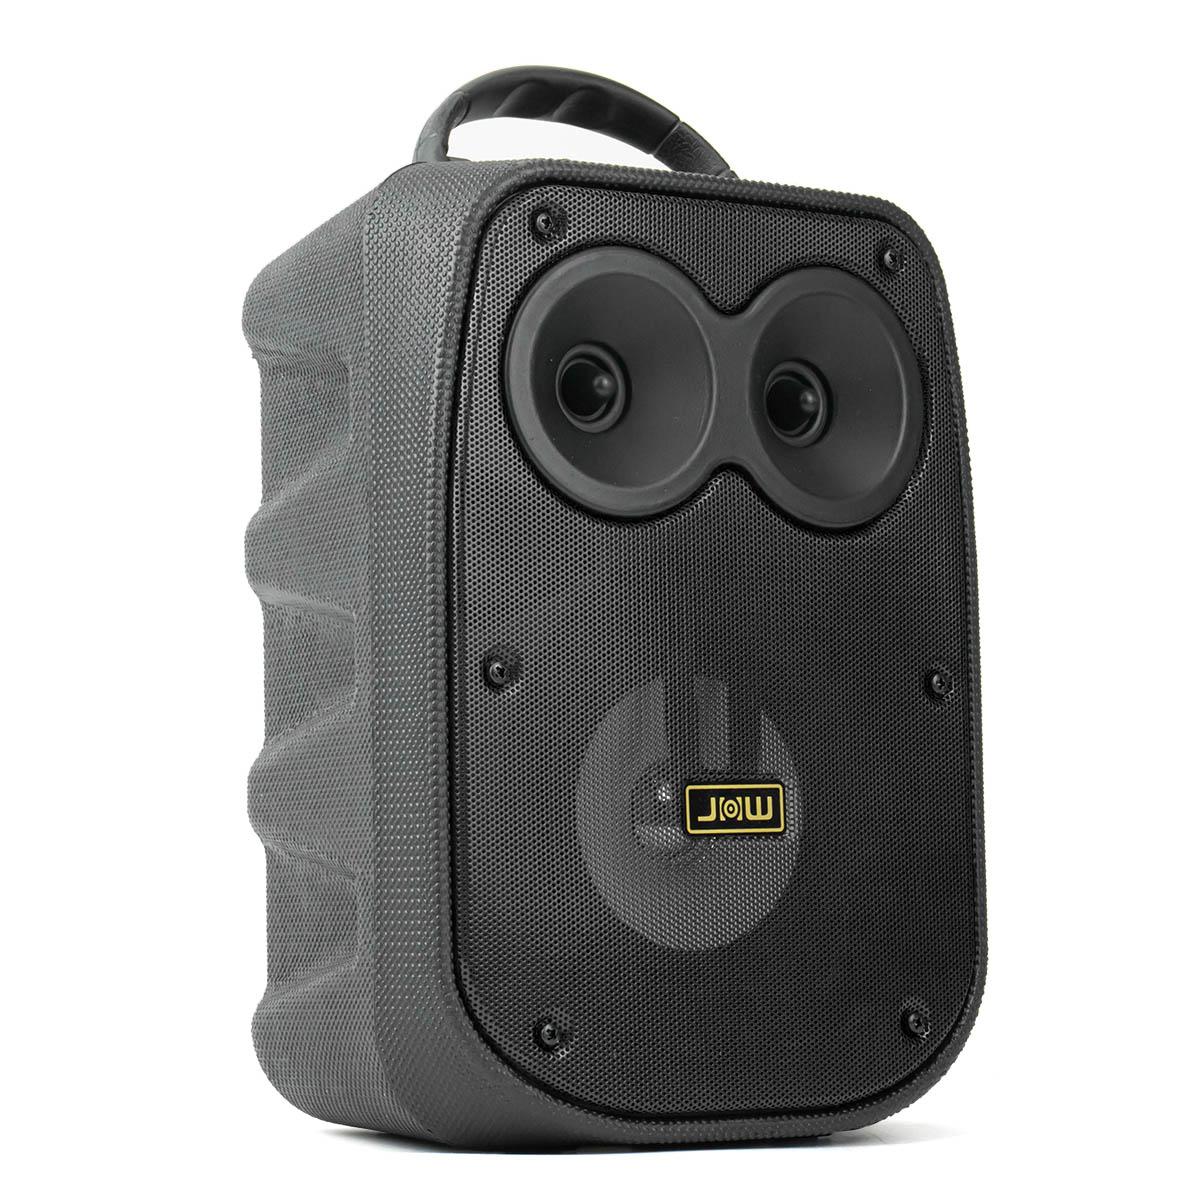 Caixa de Som Bluetooth Multimídia Portátil 3 Watts RMS JHW CS-26